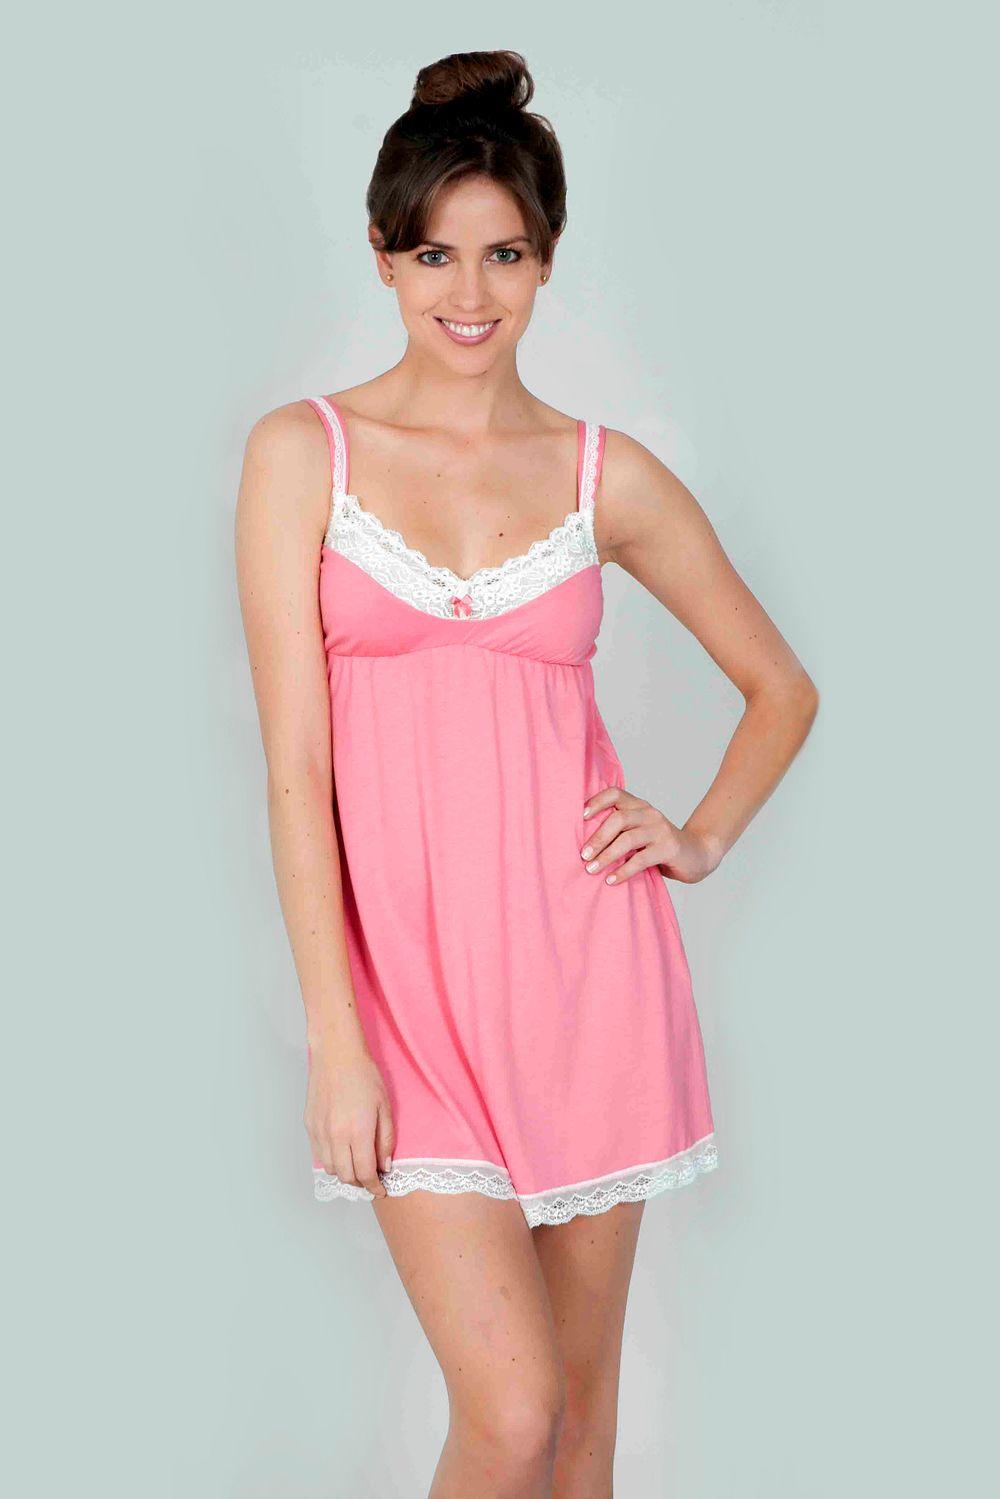 Pijama Vestido Tiras | Colección Misha | Pinterest | Pijama